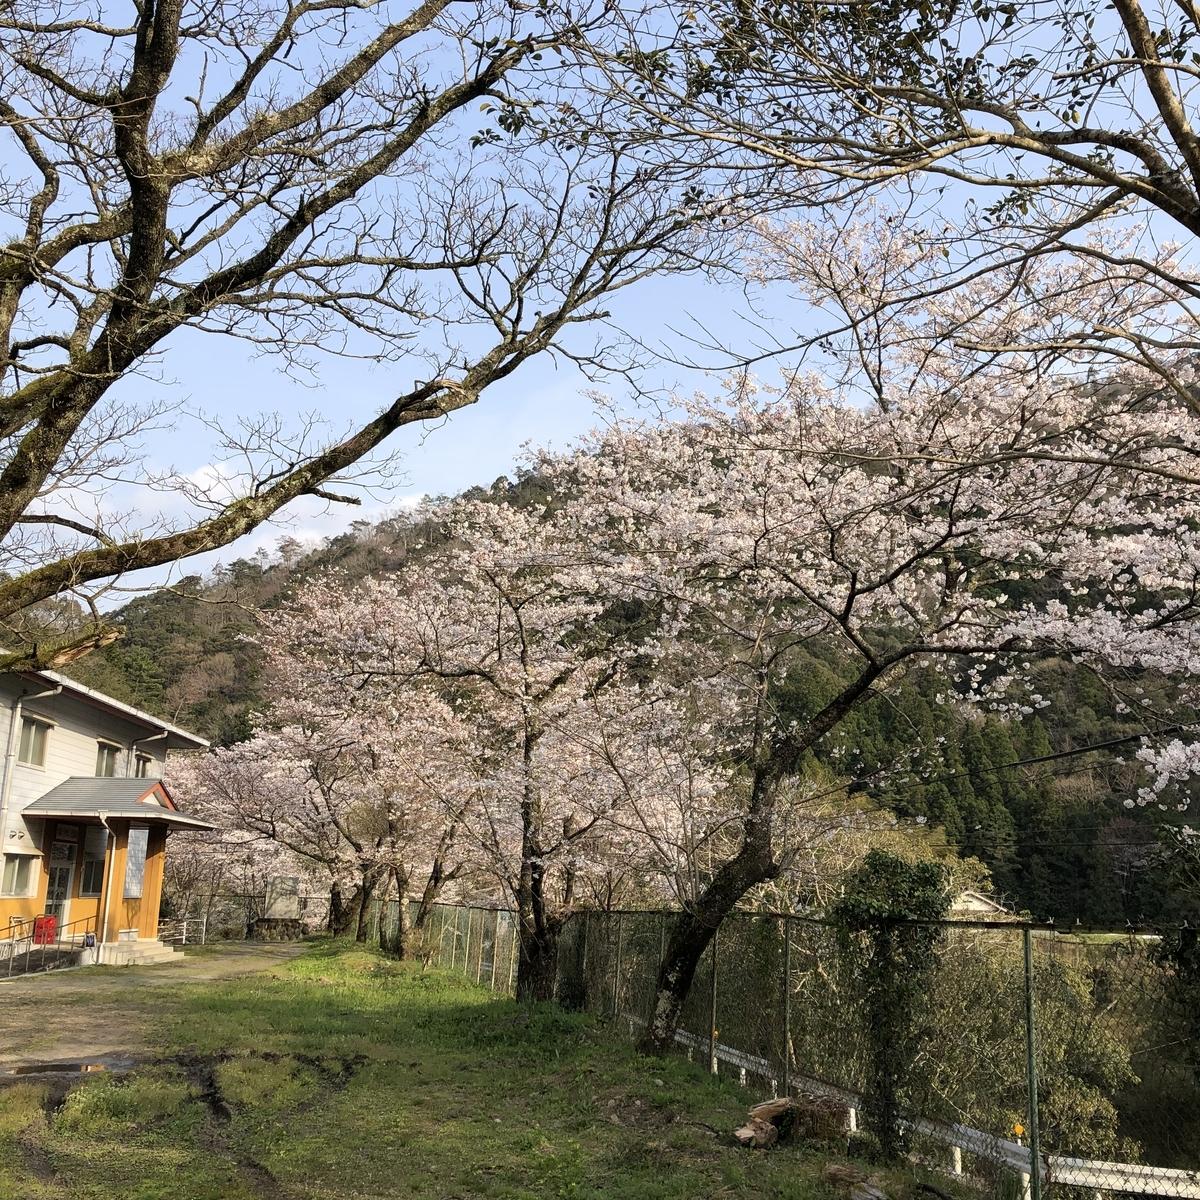 f:id:kemonomichiyoushii:20190401135821j:plain